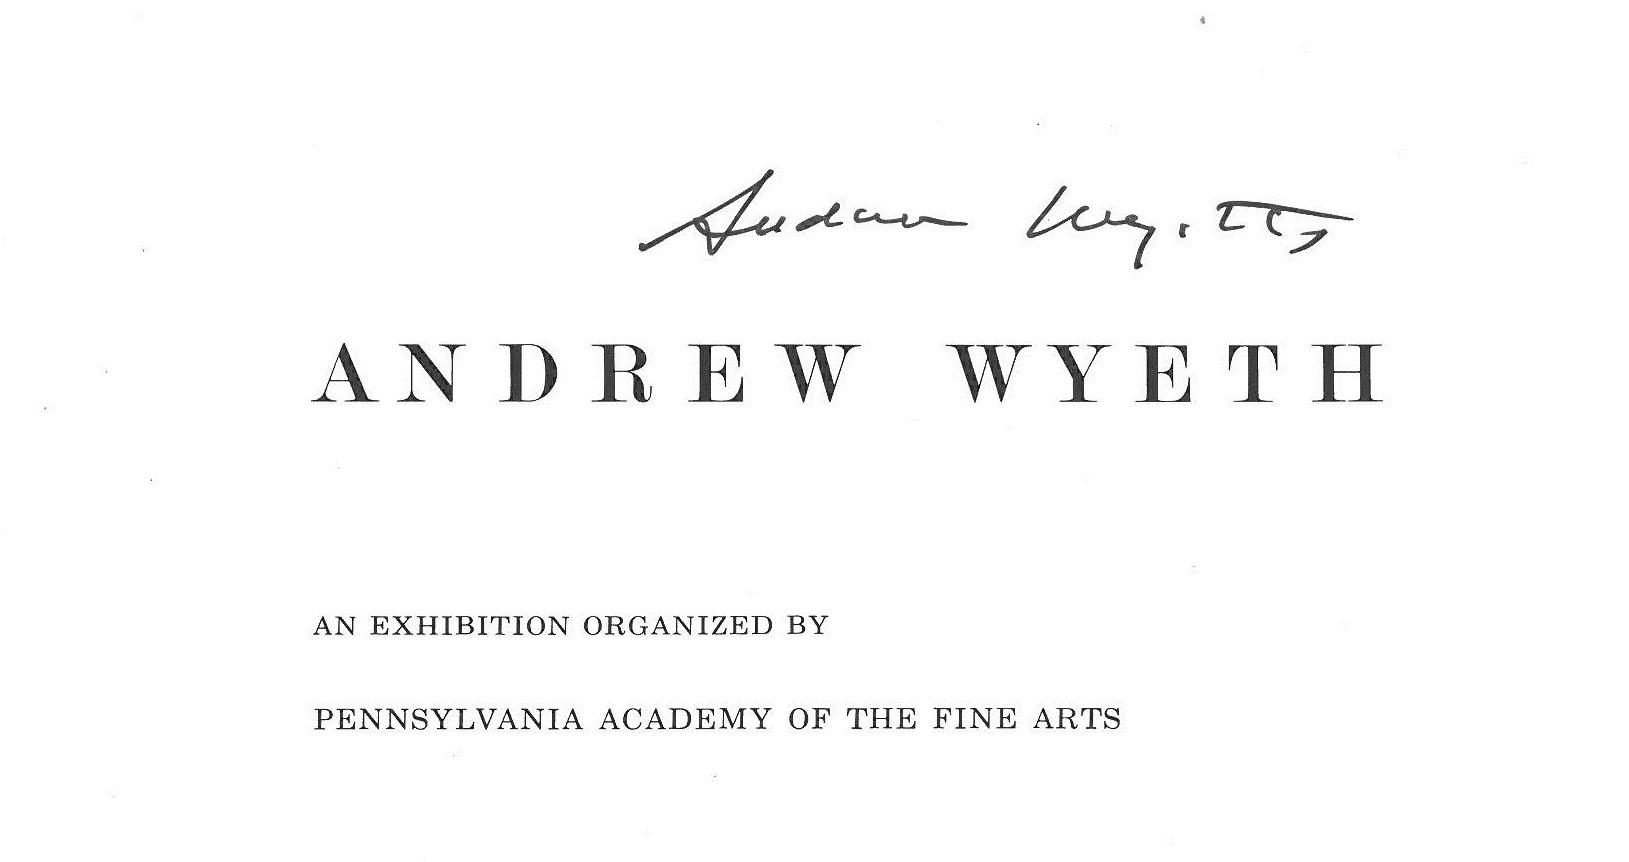 Andrew Wyeth's autograph